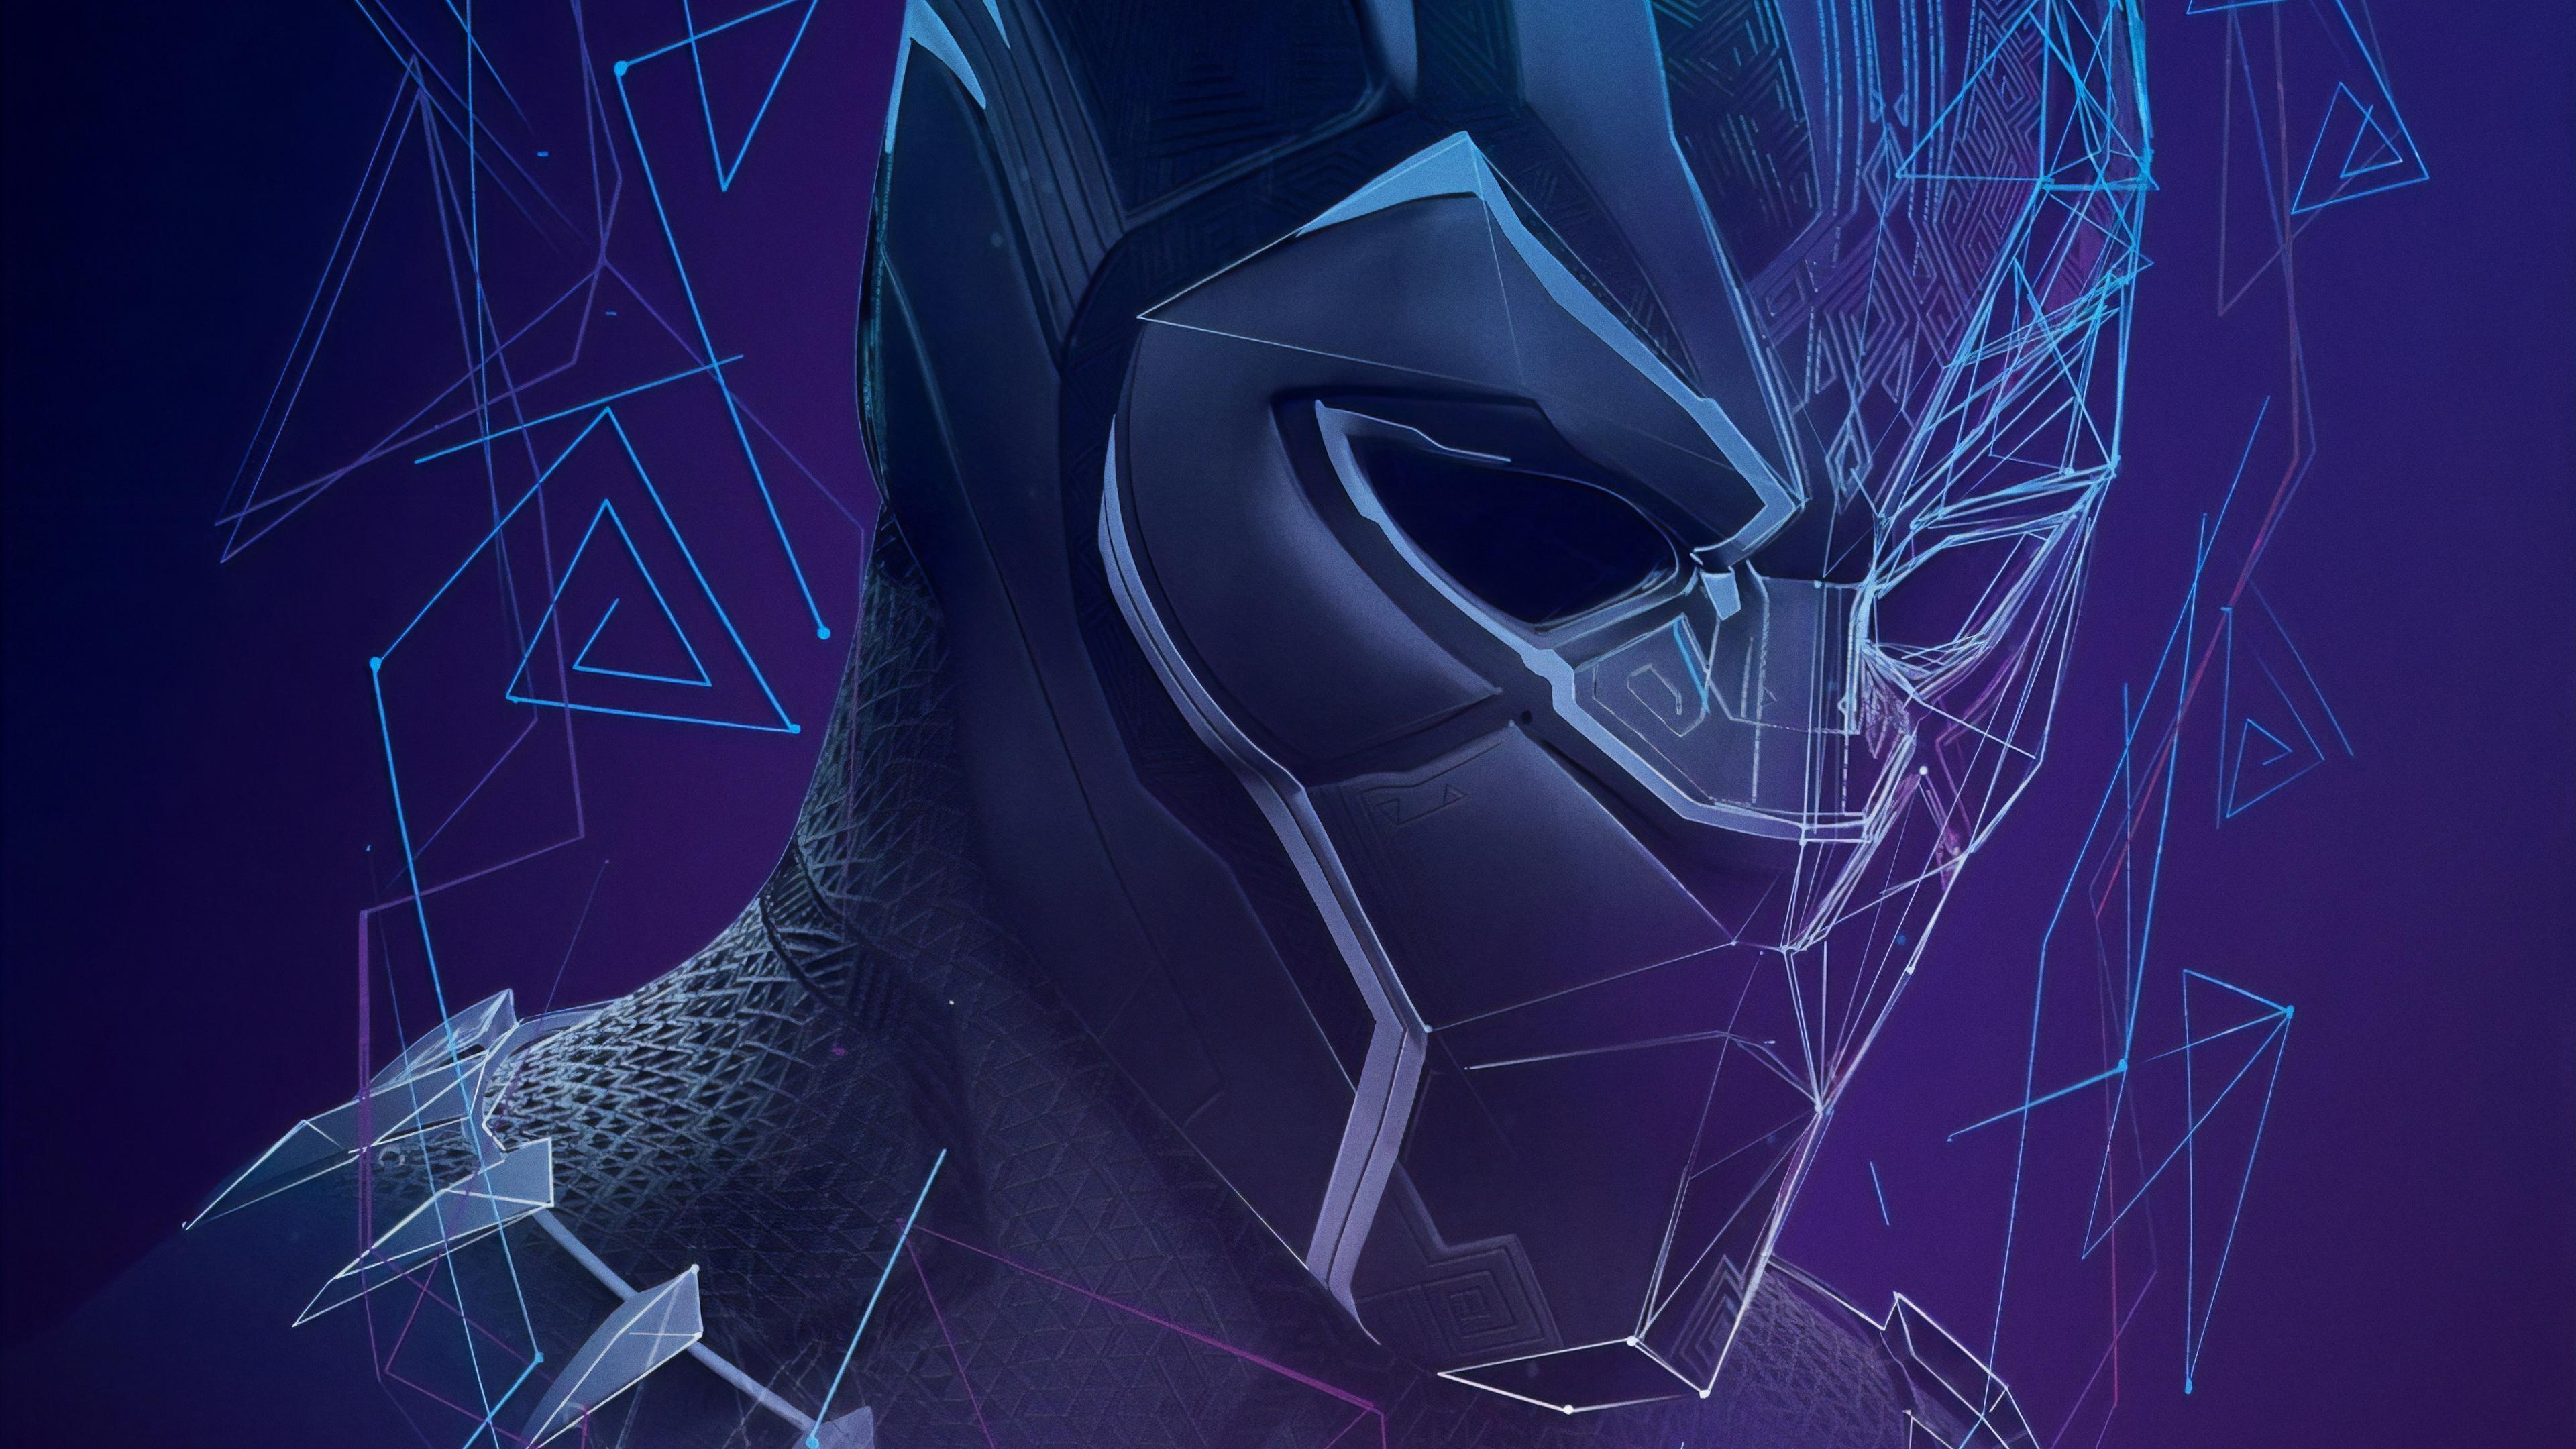 black panther fractal art 4k 1559764143 - Black Panther Fractal Art 4k - superheroes wallpapers, hd-wallpapers, digital art wallpapers, black panther wallpapers, artwork wallpapers, artist wallpapers, 4k-wallpapers